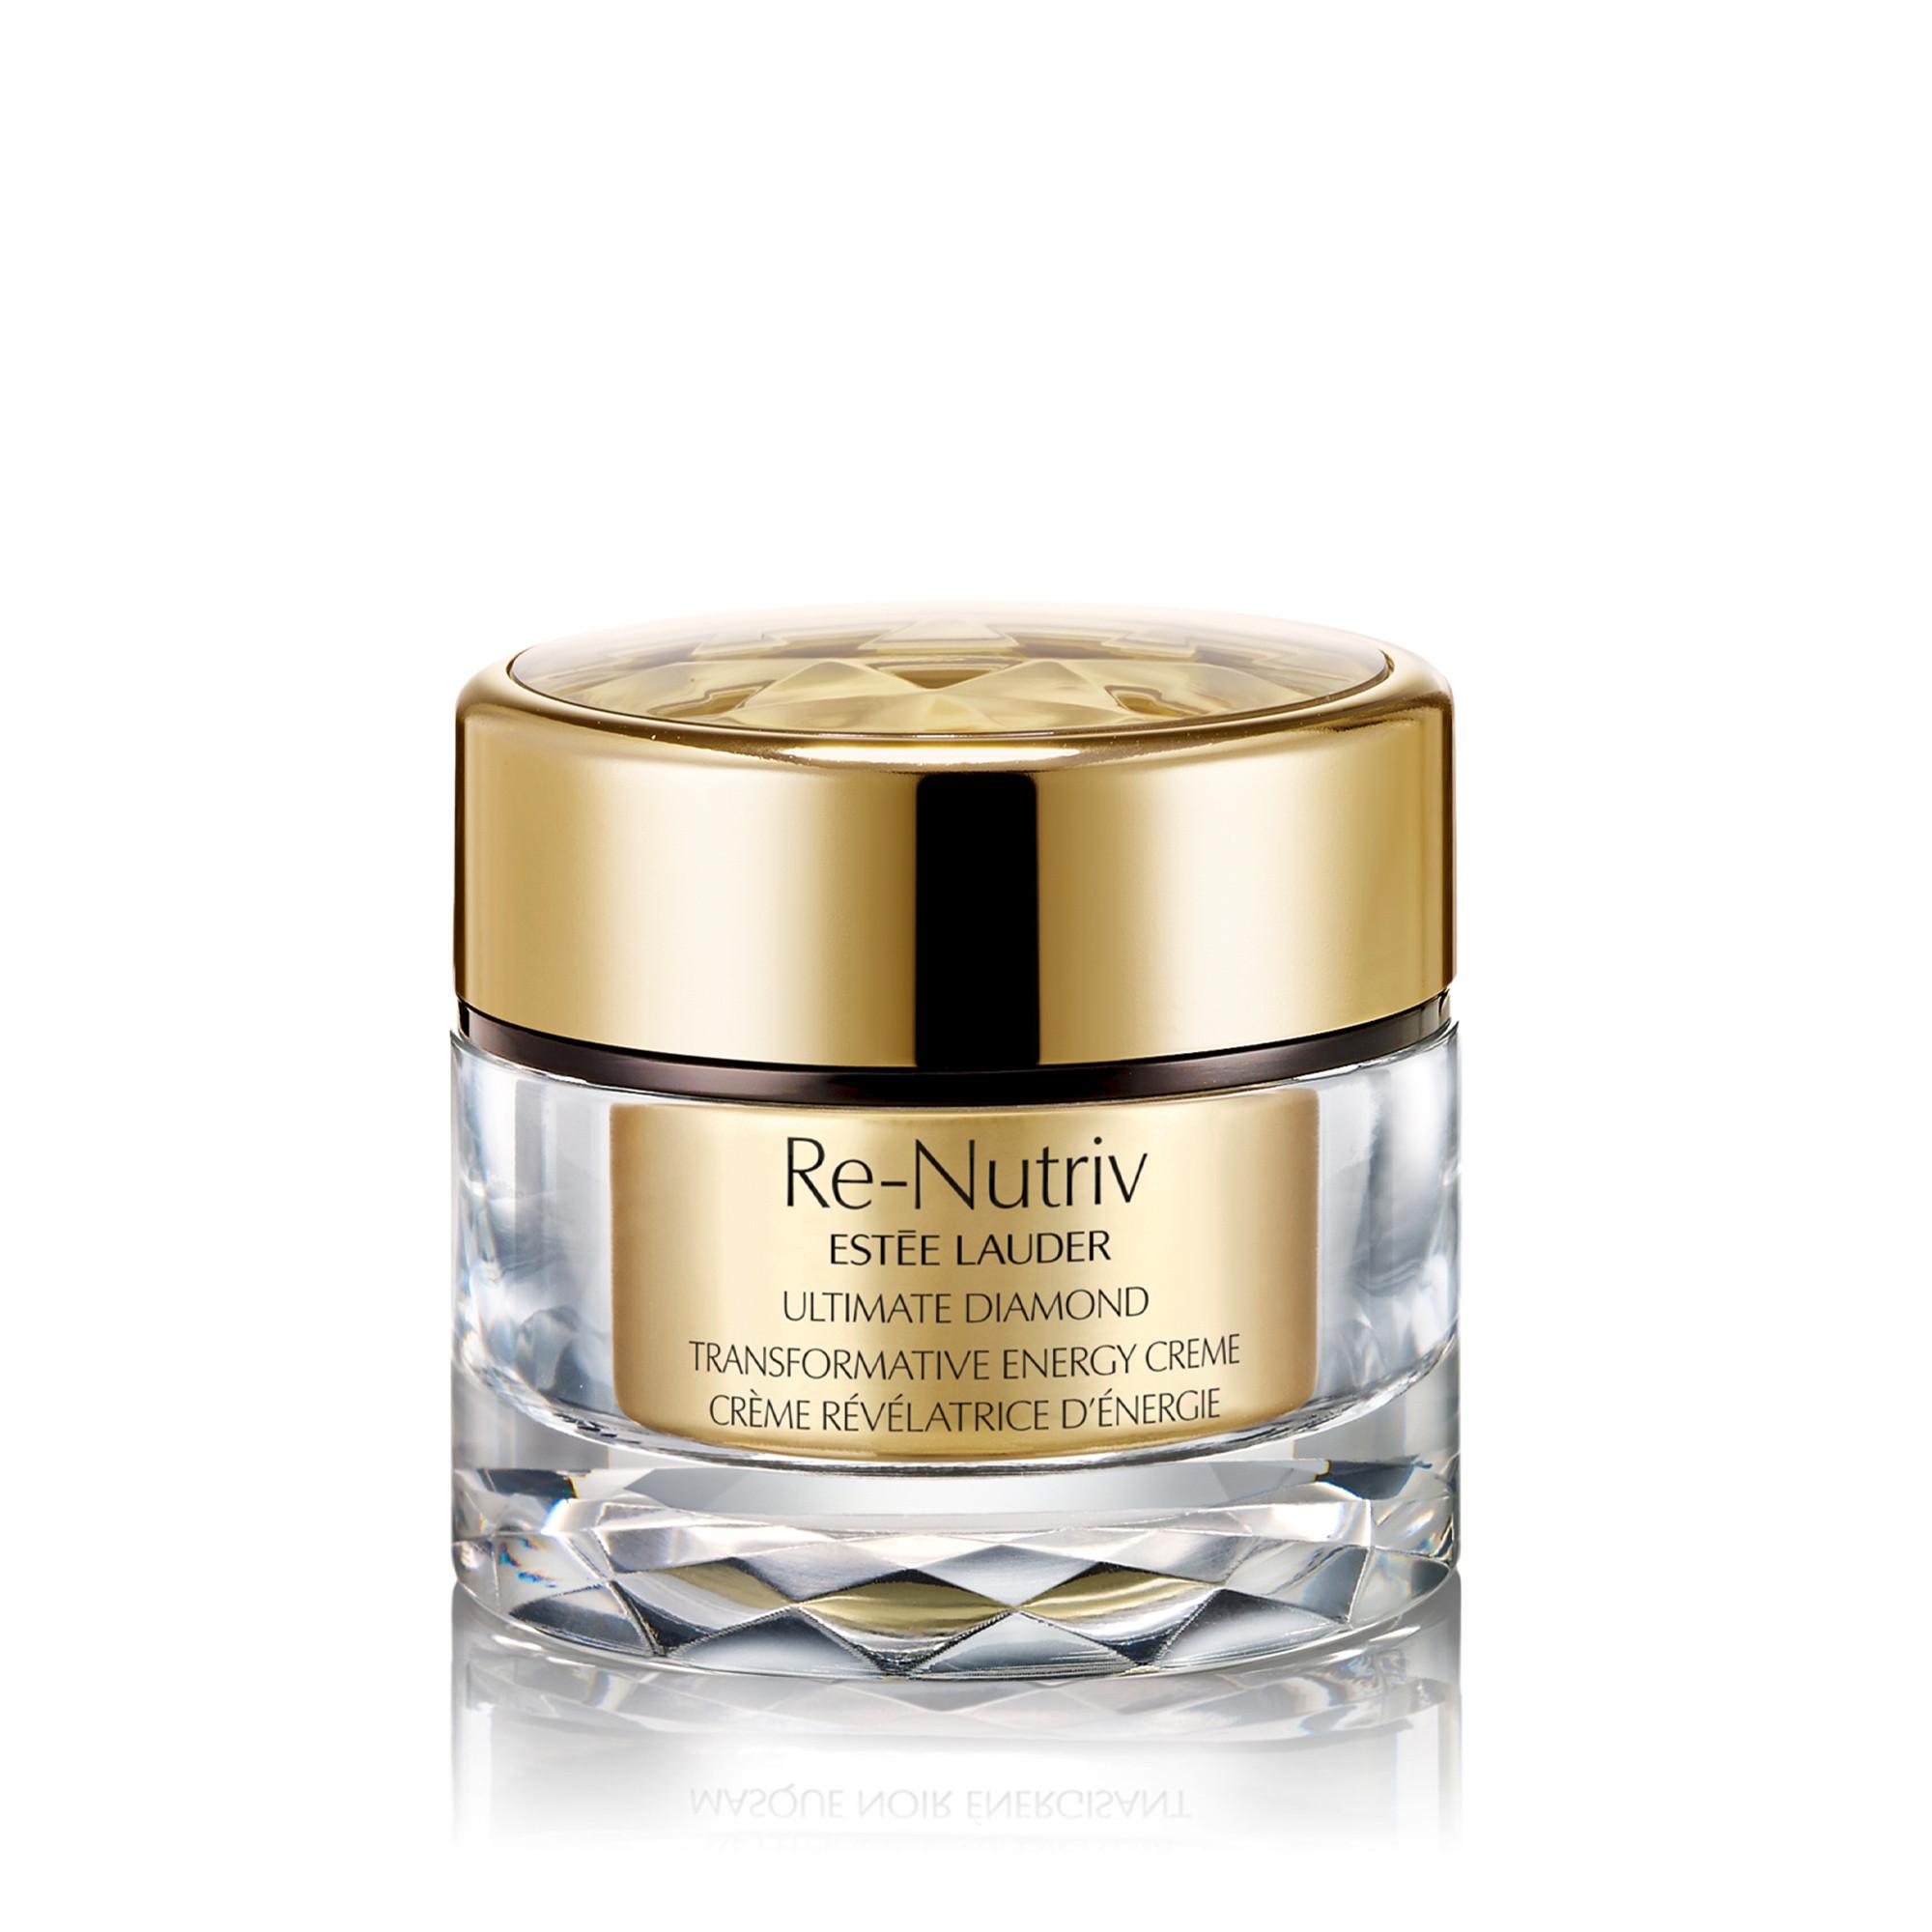 Estée Lauder re-nutriv ultimate diamond transformative energy creme rich 50 ml, Giallo oro, large image number 0